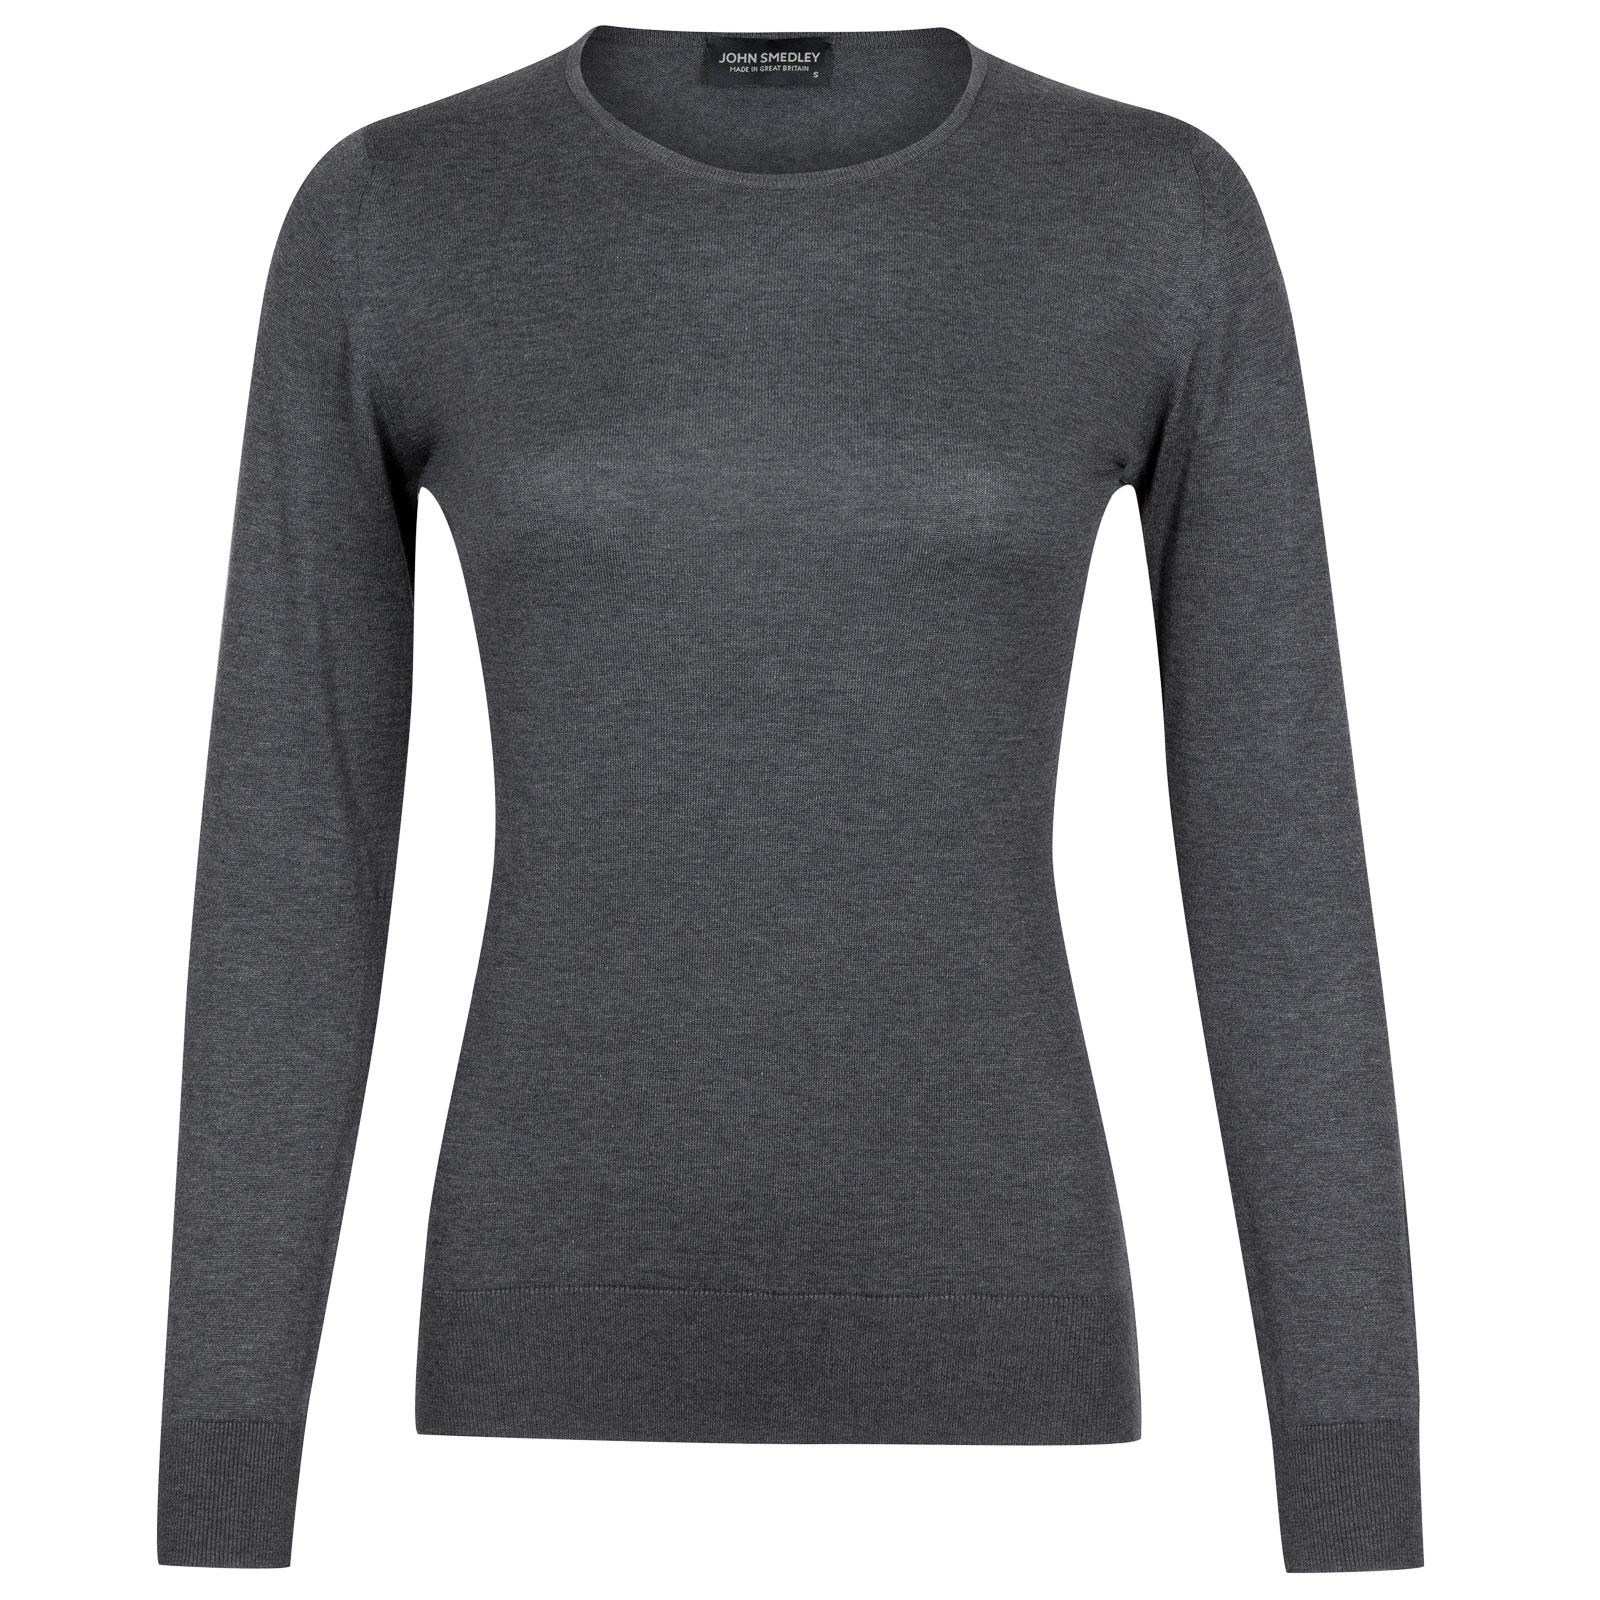 John Smedley paddington Sea Island Cotton Sweater in Charcoal-M